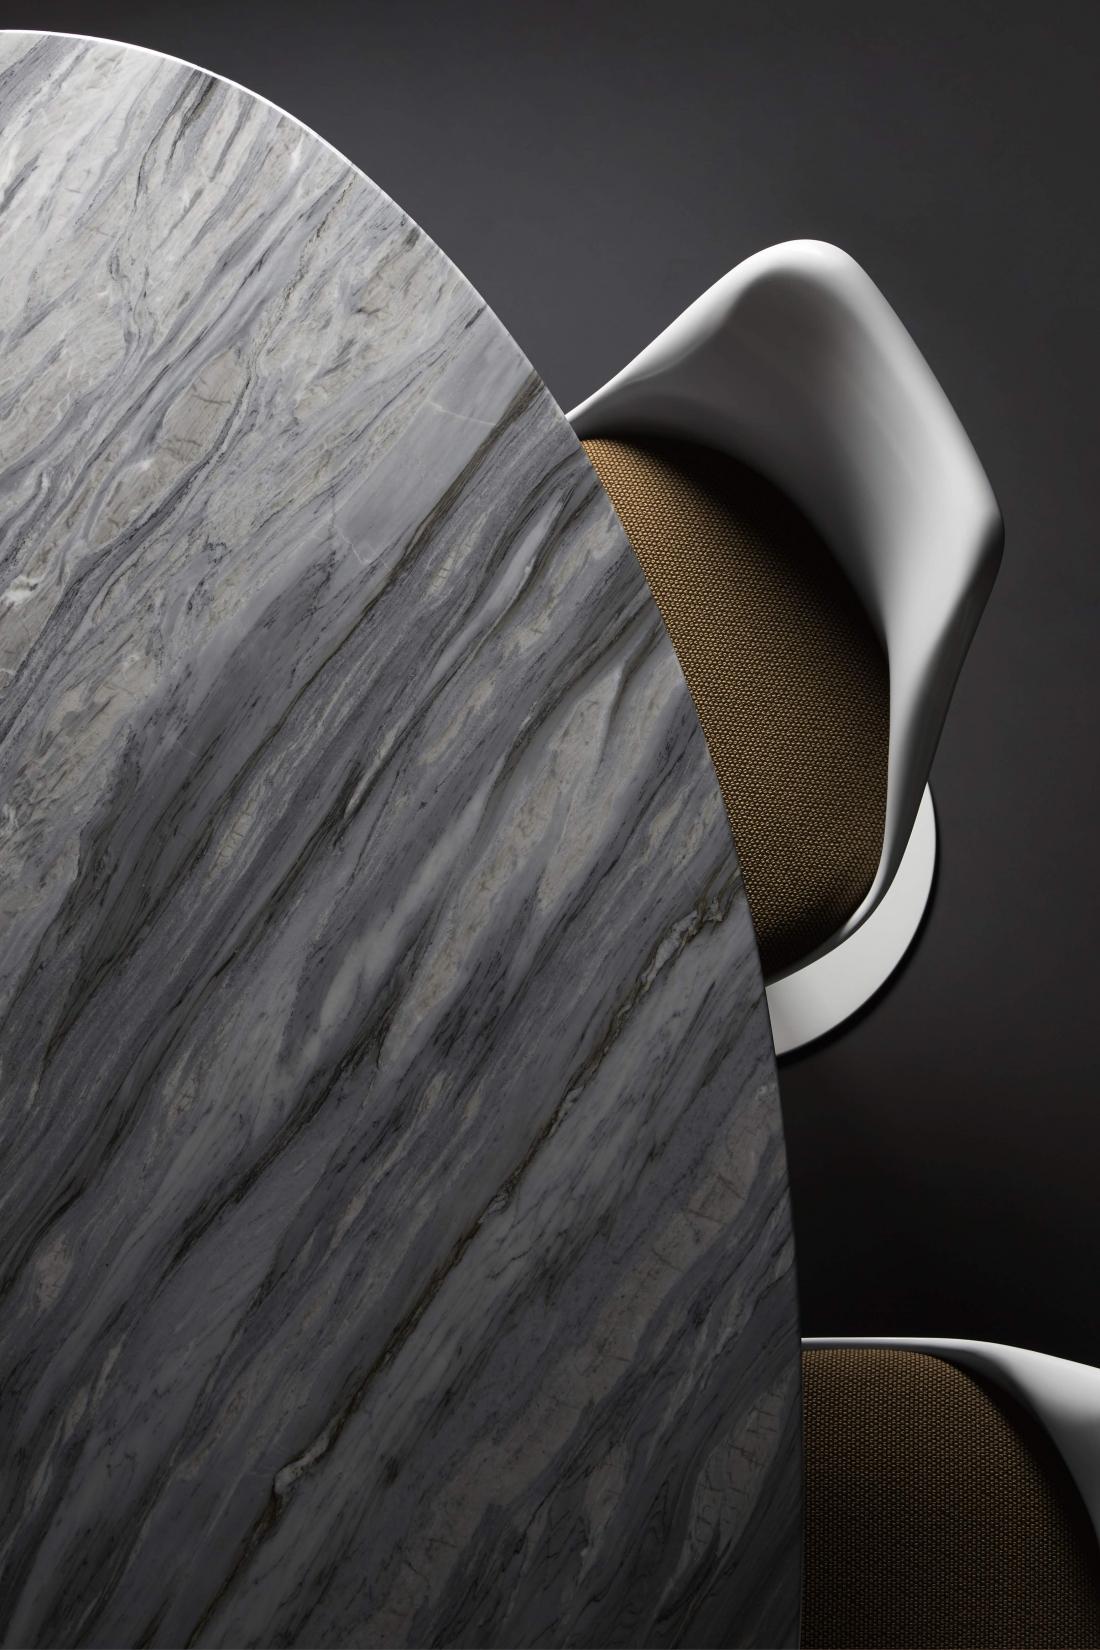 Eero Saarinen Pedestal Table Series